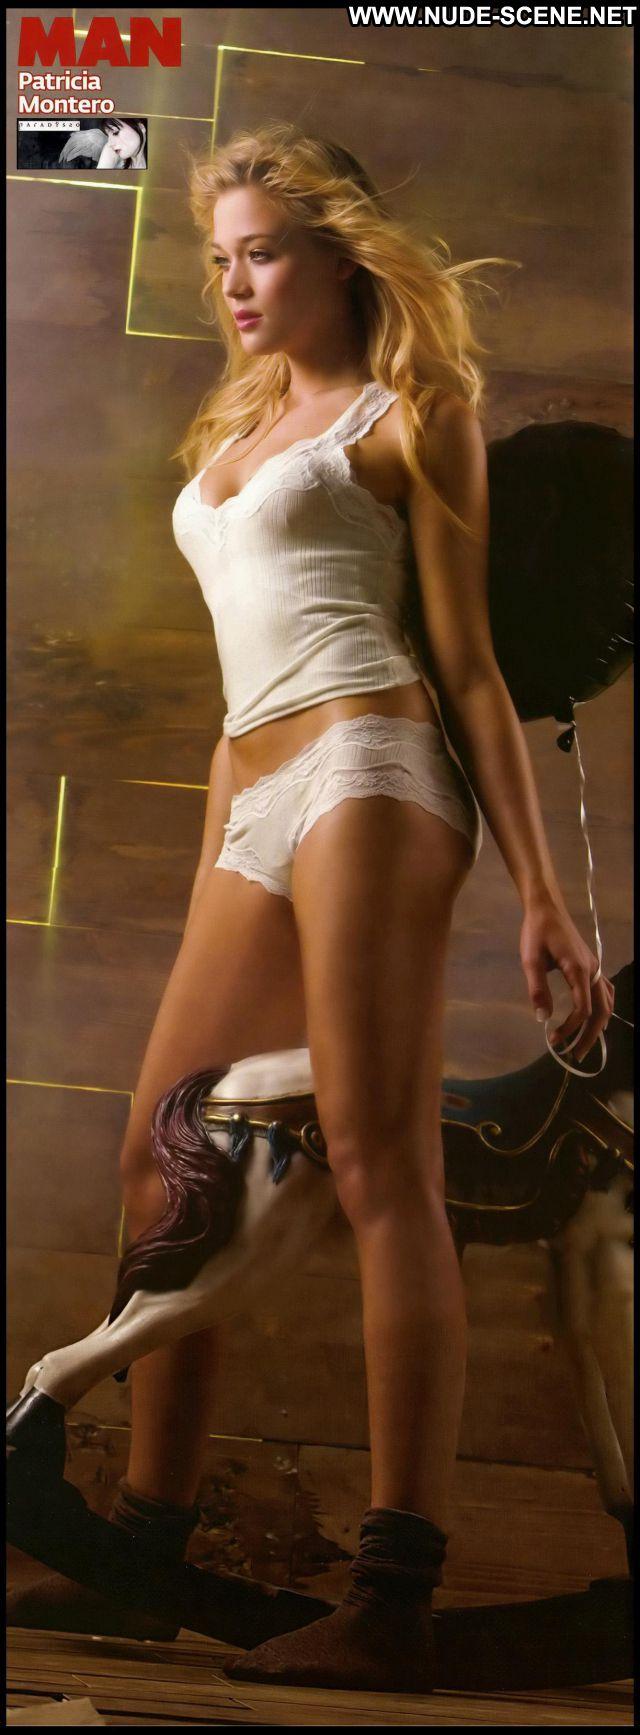 Patricia Montero No Source Cute Celebrity Blonde Posing Hot Celebrity